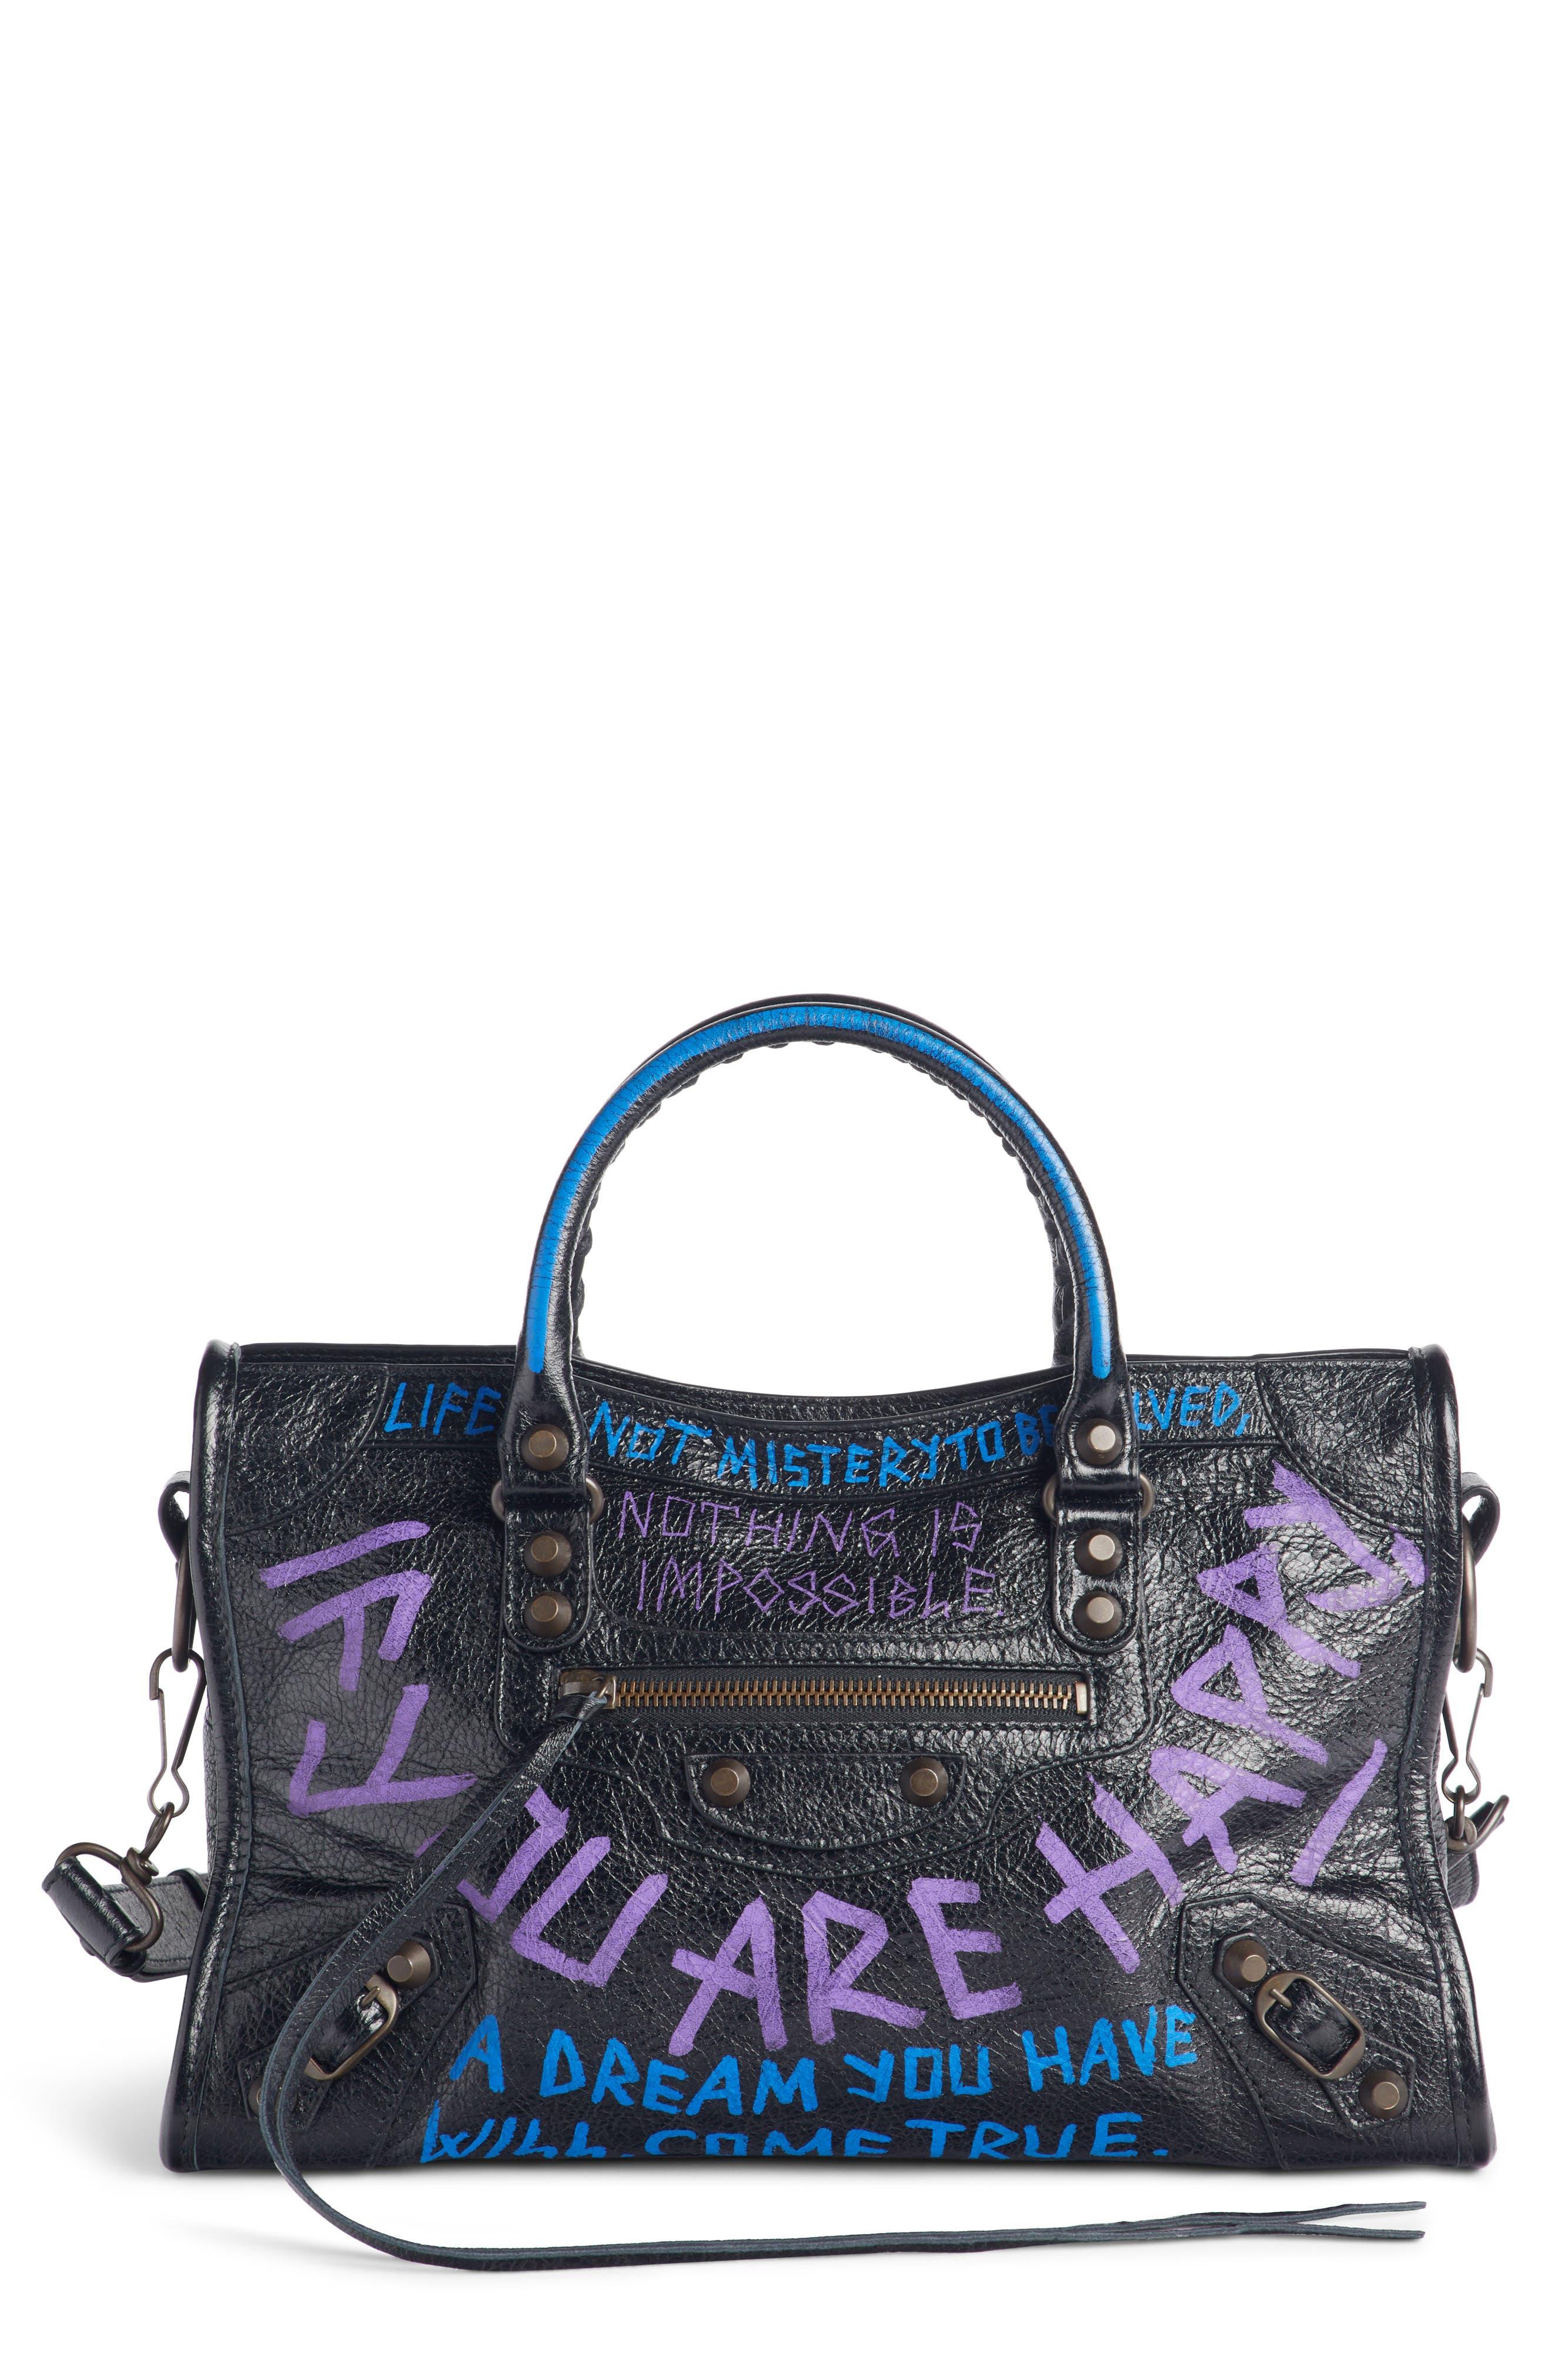 Small Classic City Graffiti Leather Tote,                             Main thumbnail 1, color,                             NOIR/ BLEU/ VIOLET